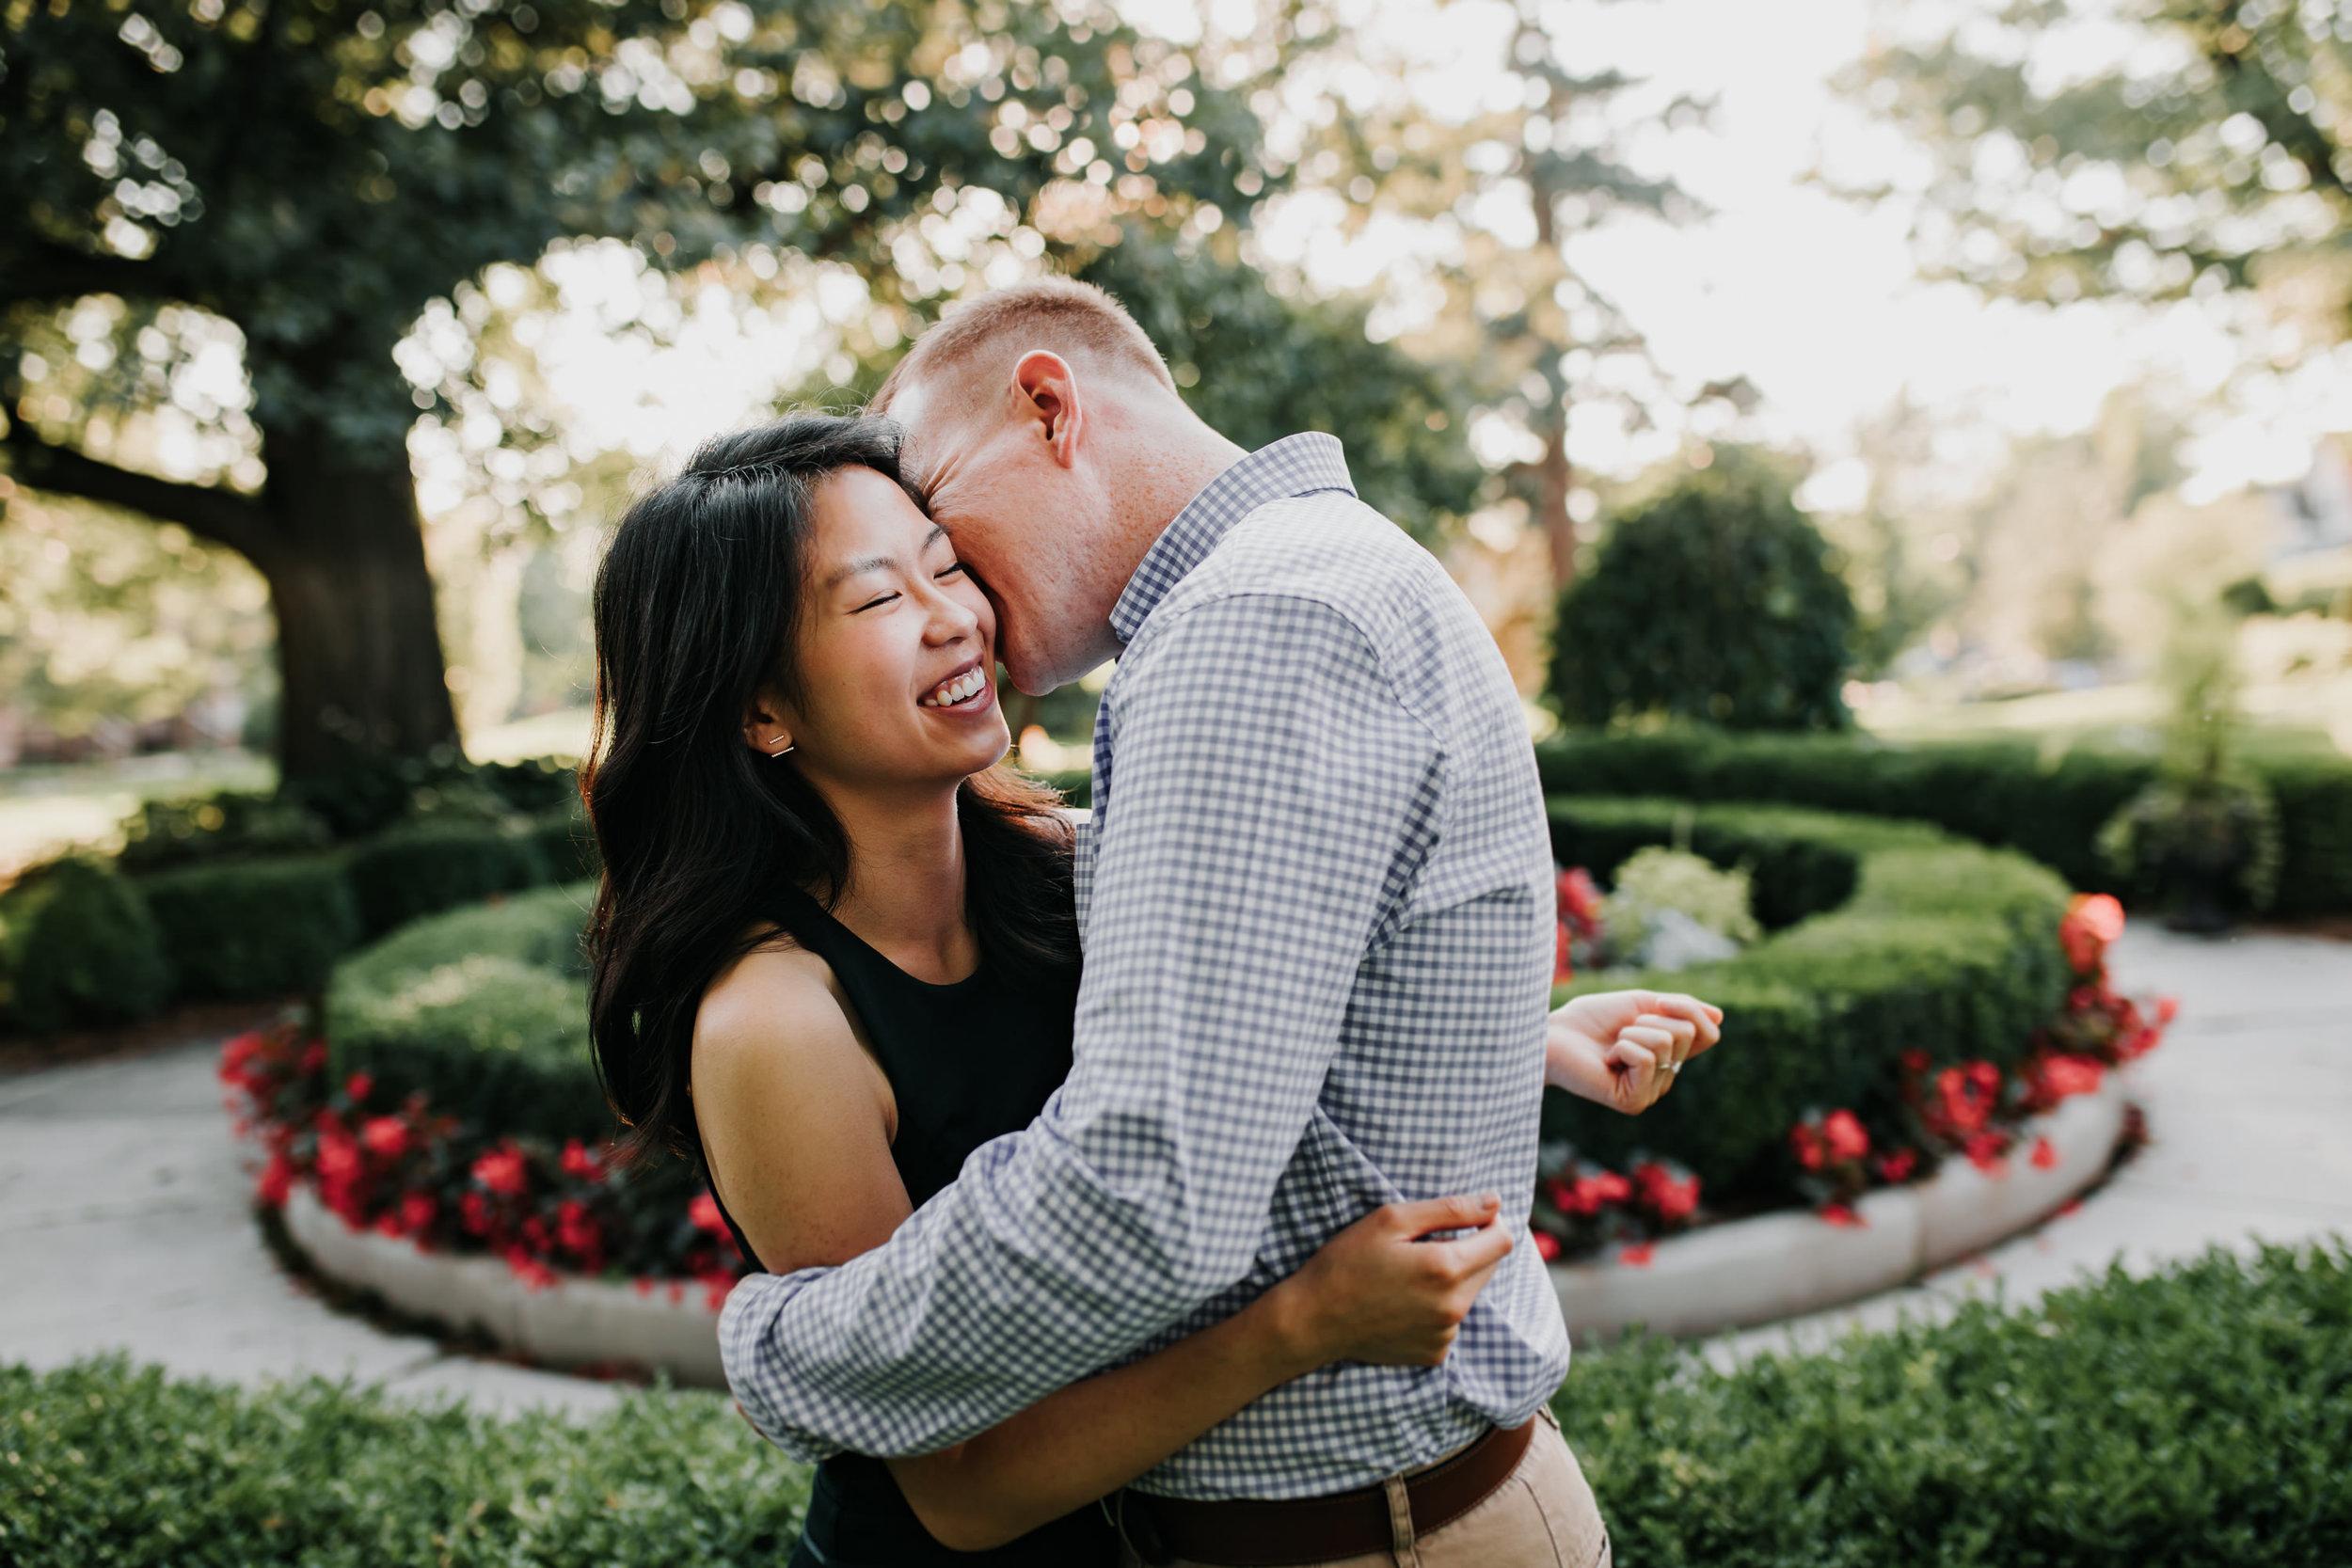 Catherin & Kyle - Married - Nathaniel Jensen Photography - Omaha Nebraska Wedding Photograper - Memorial Park - Joslyn Castle Engagement Session-35.jpg